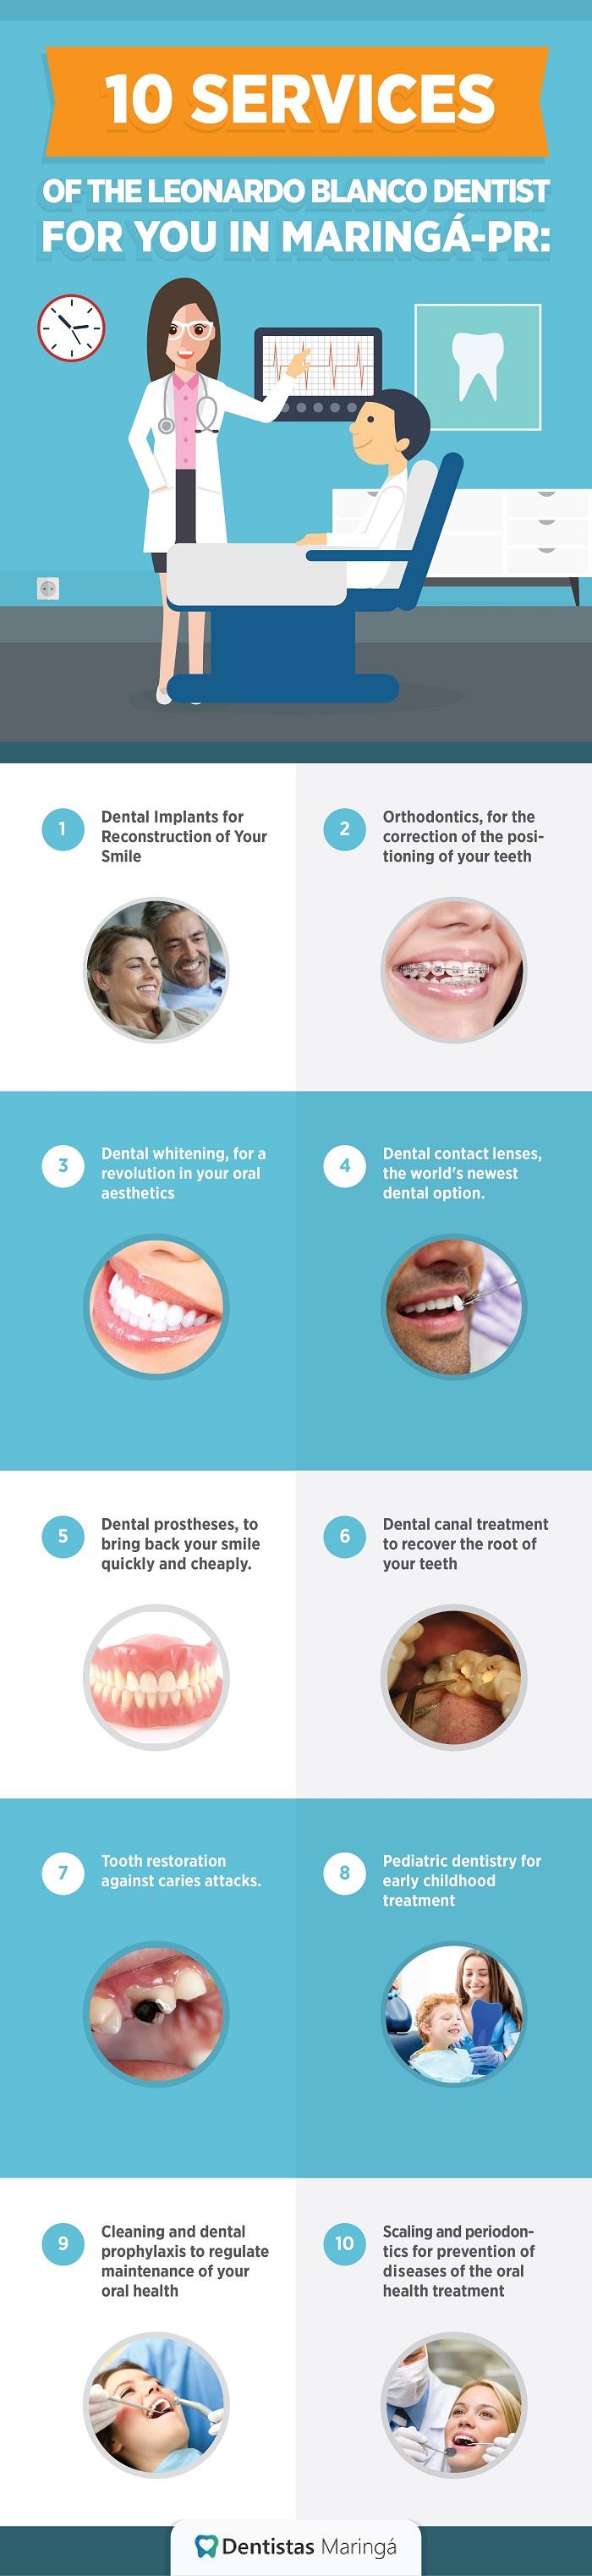 10 Services of the Leonardo Blanco Dentist for you in Maringá-PR